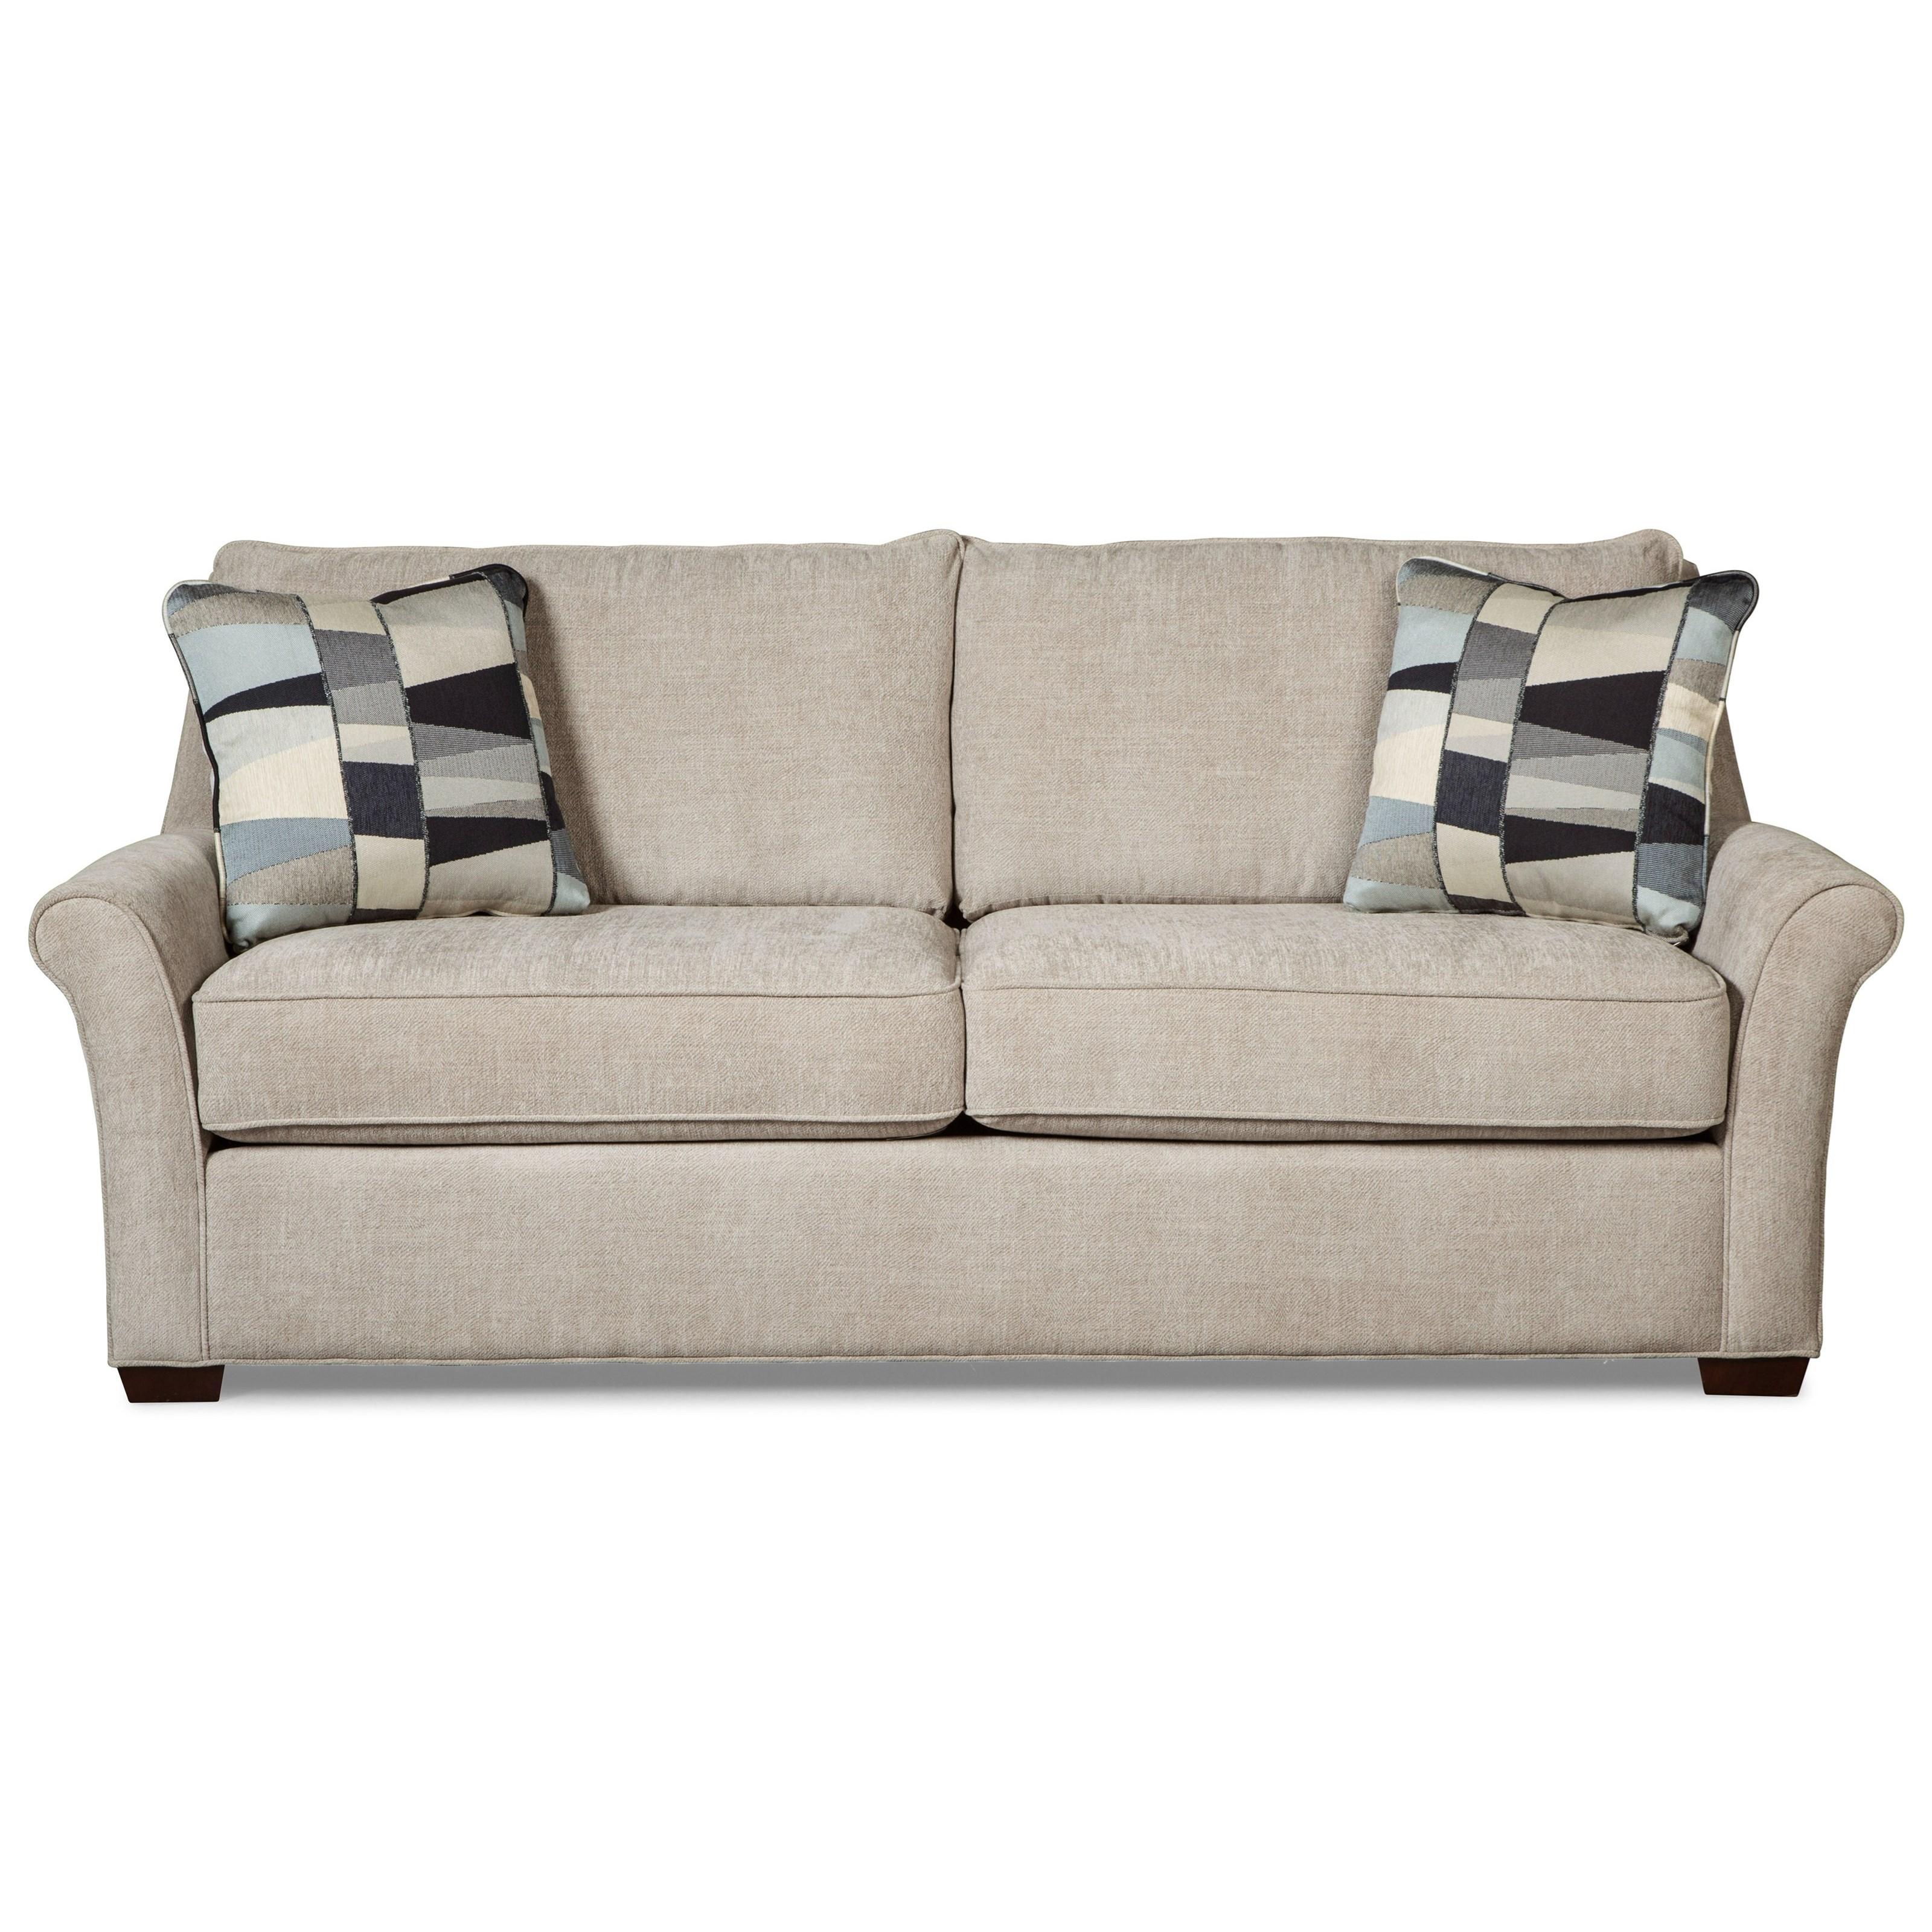 craftmaster 7686 768650 98 transitional queen sleeper sofa with rh hudsonsfurniture com Discount Memory Foam Seats Sofa Memory Foam Convertible Sofa